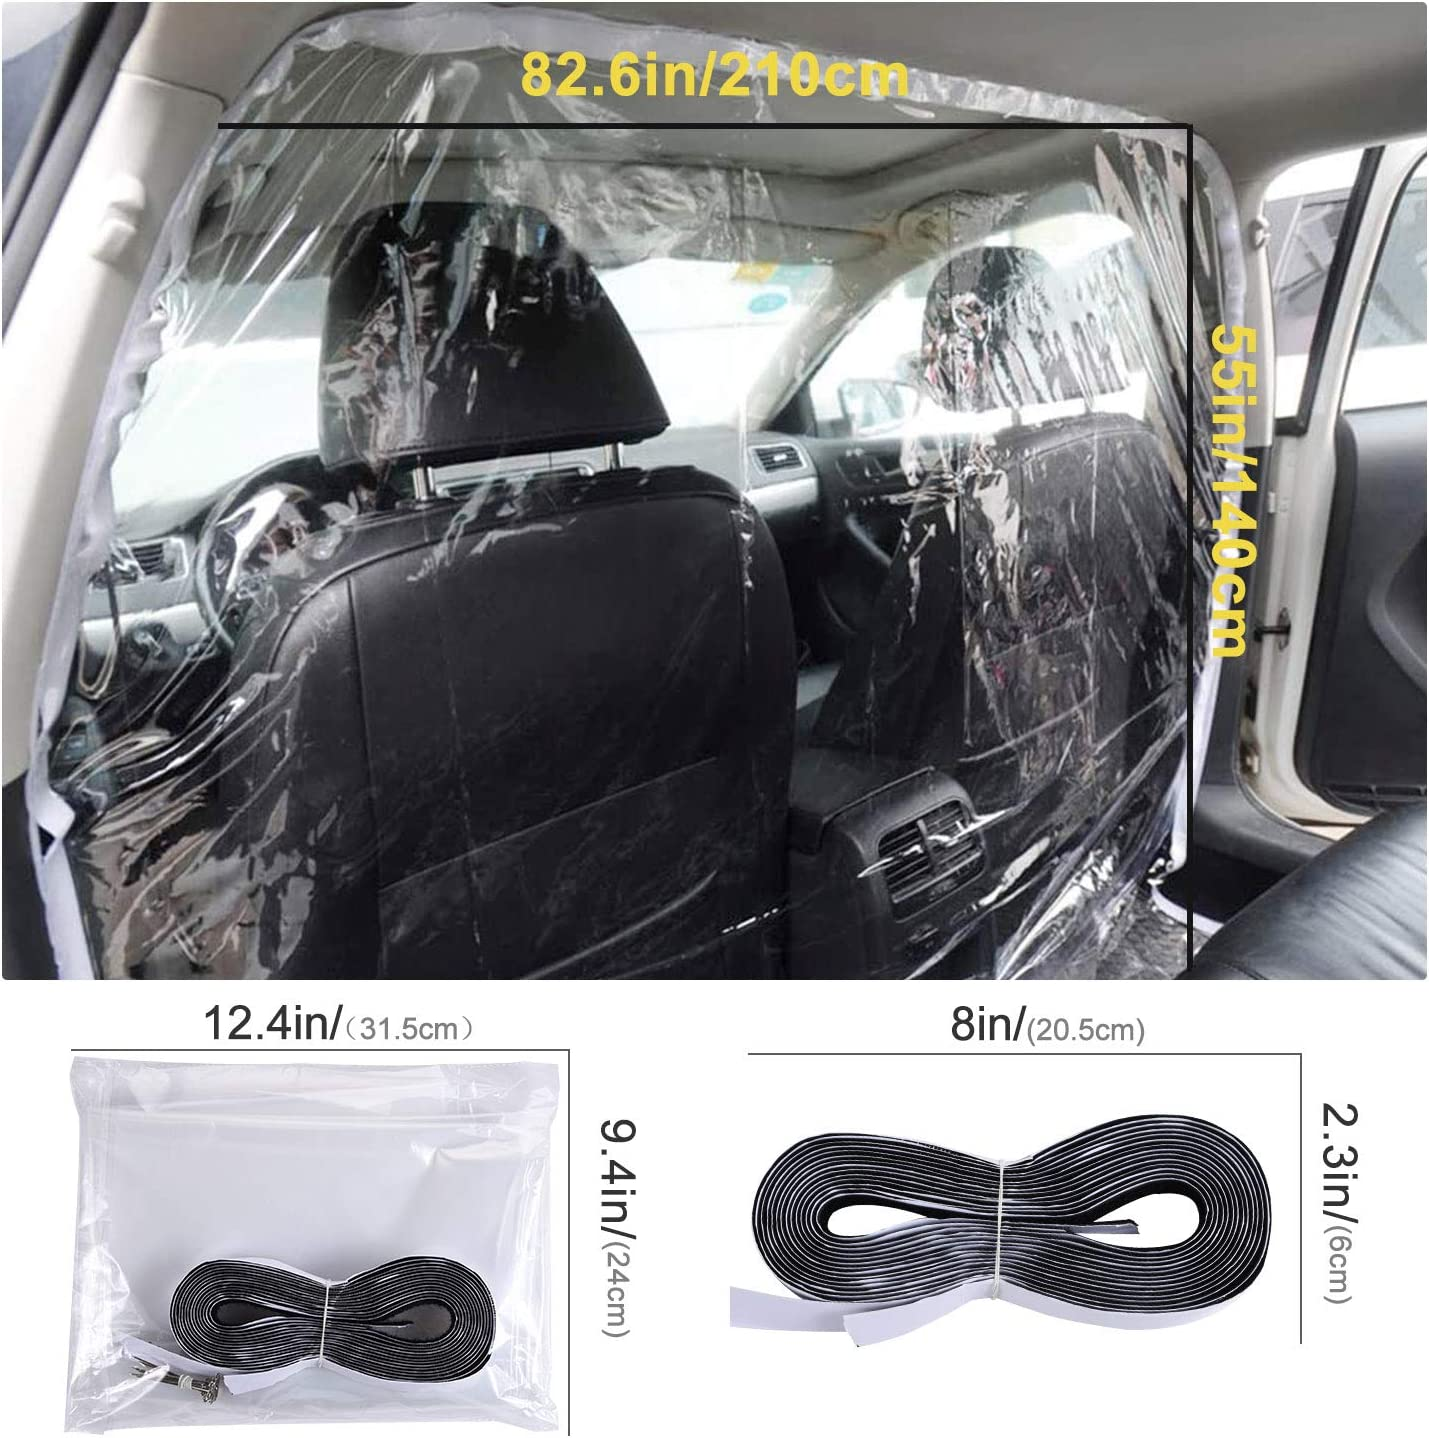 Funmo Taxi transparent Isolationsfolie Autoschutz f/ür Fahrer Transparente Tropfschutzfolie Spuckschutz Trennwand F/ür Auto